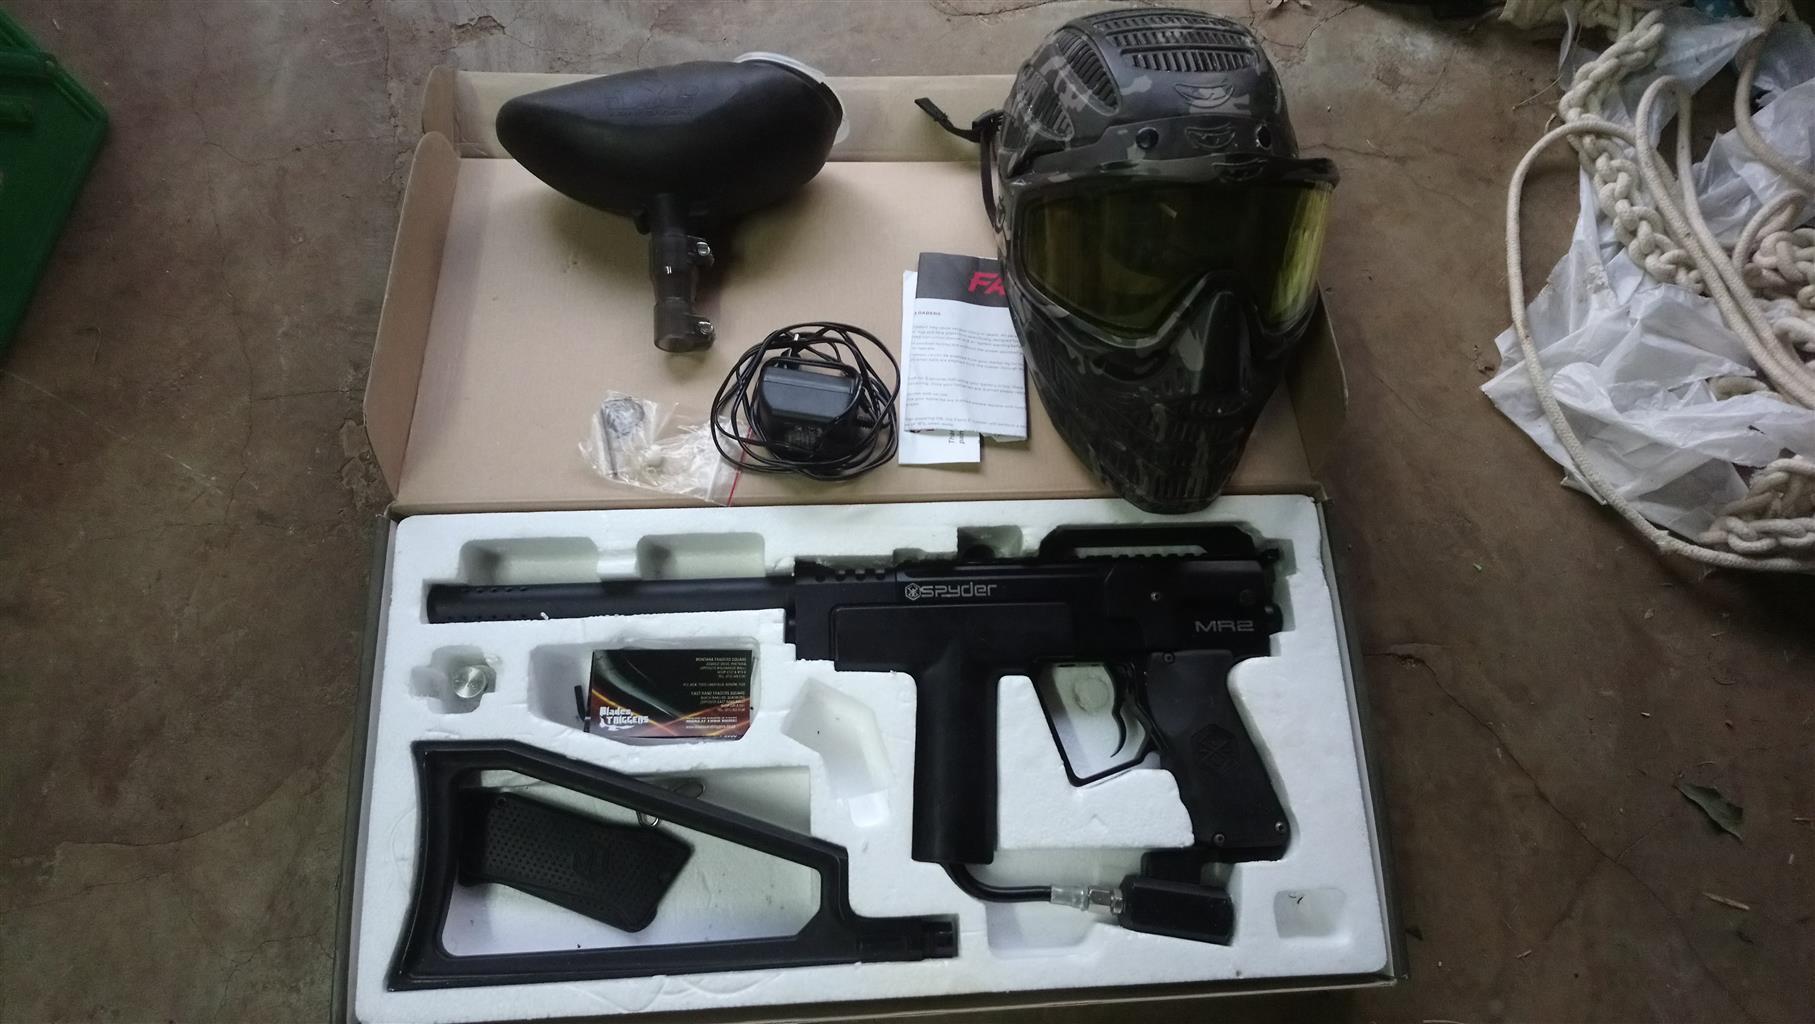 spyder mr2 paintball gun